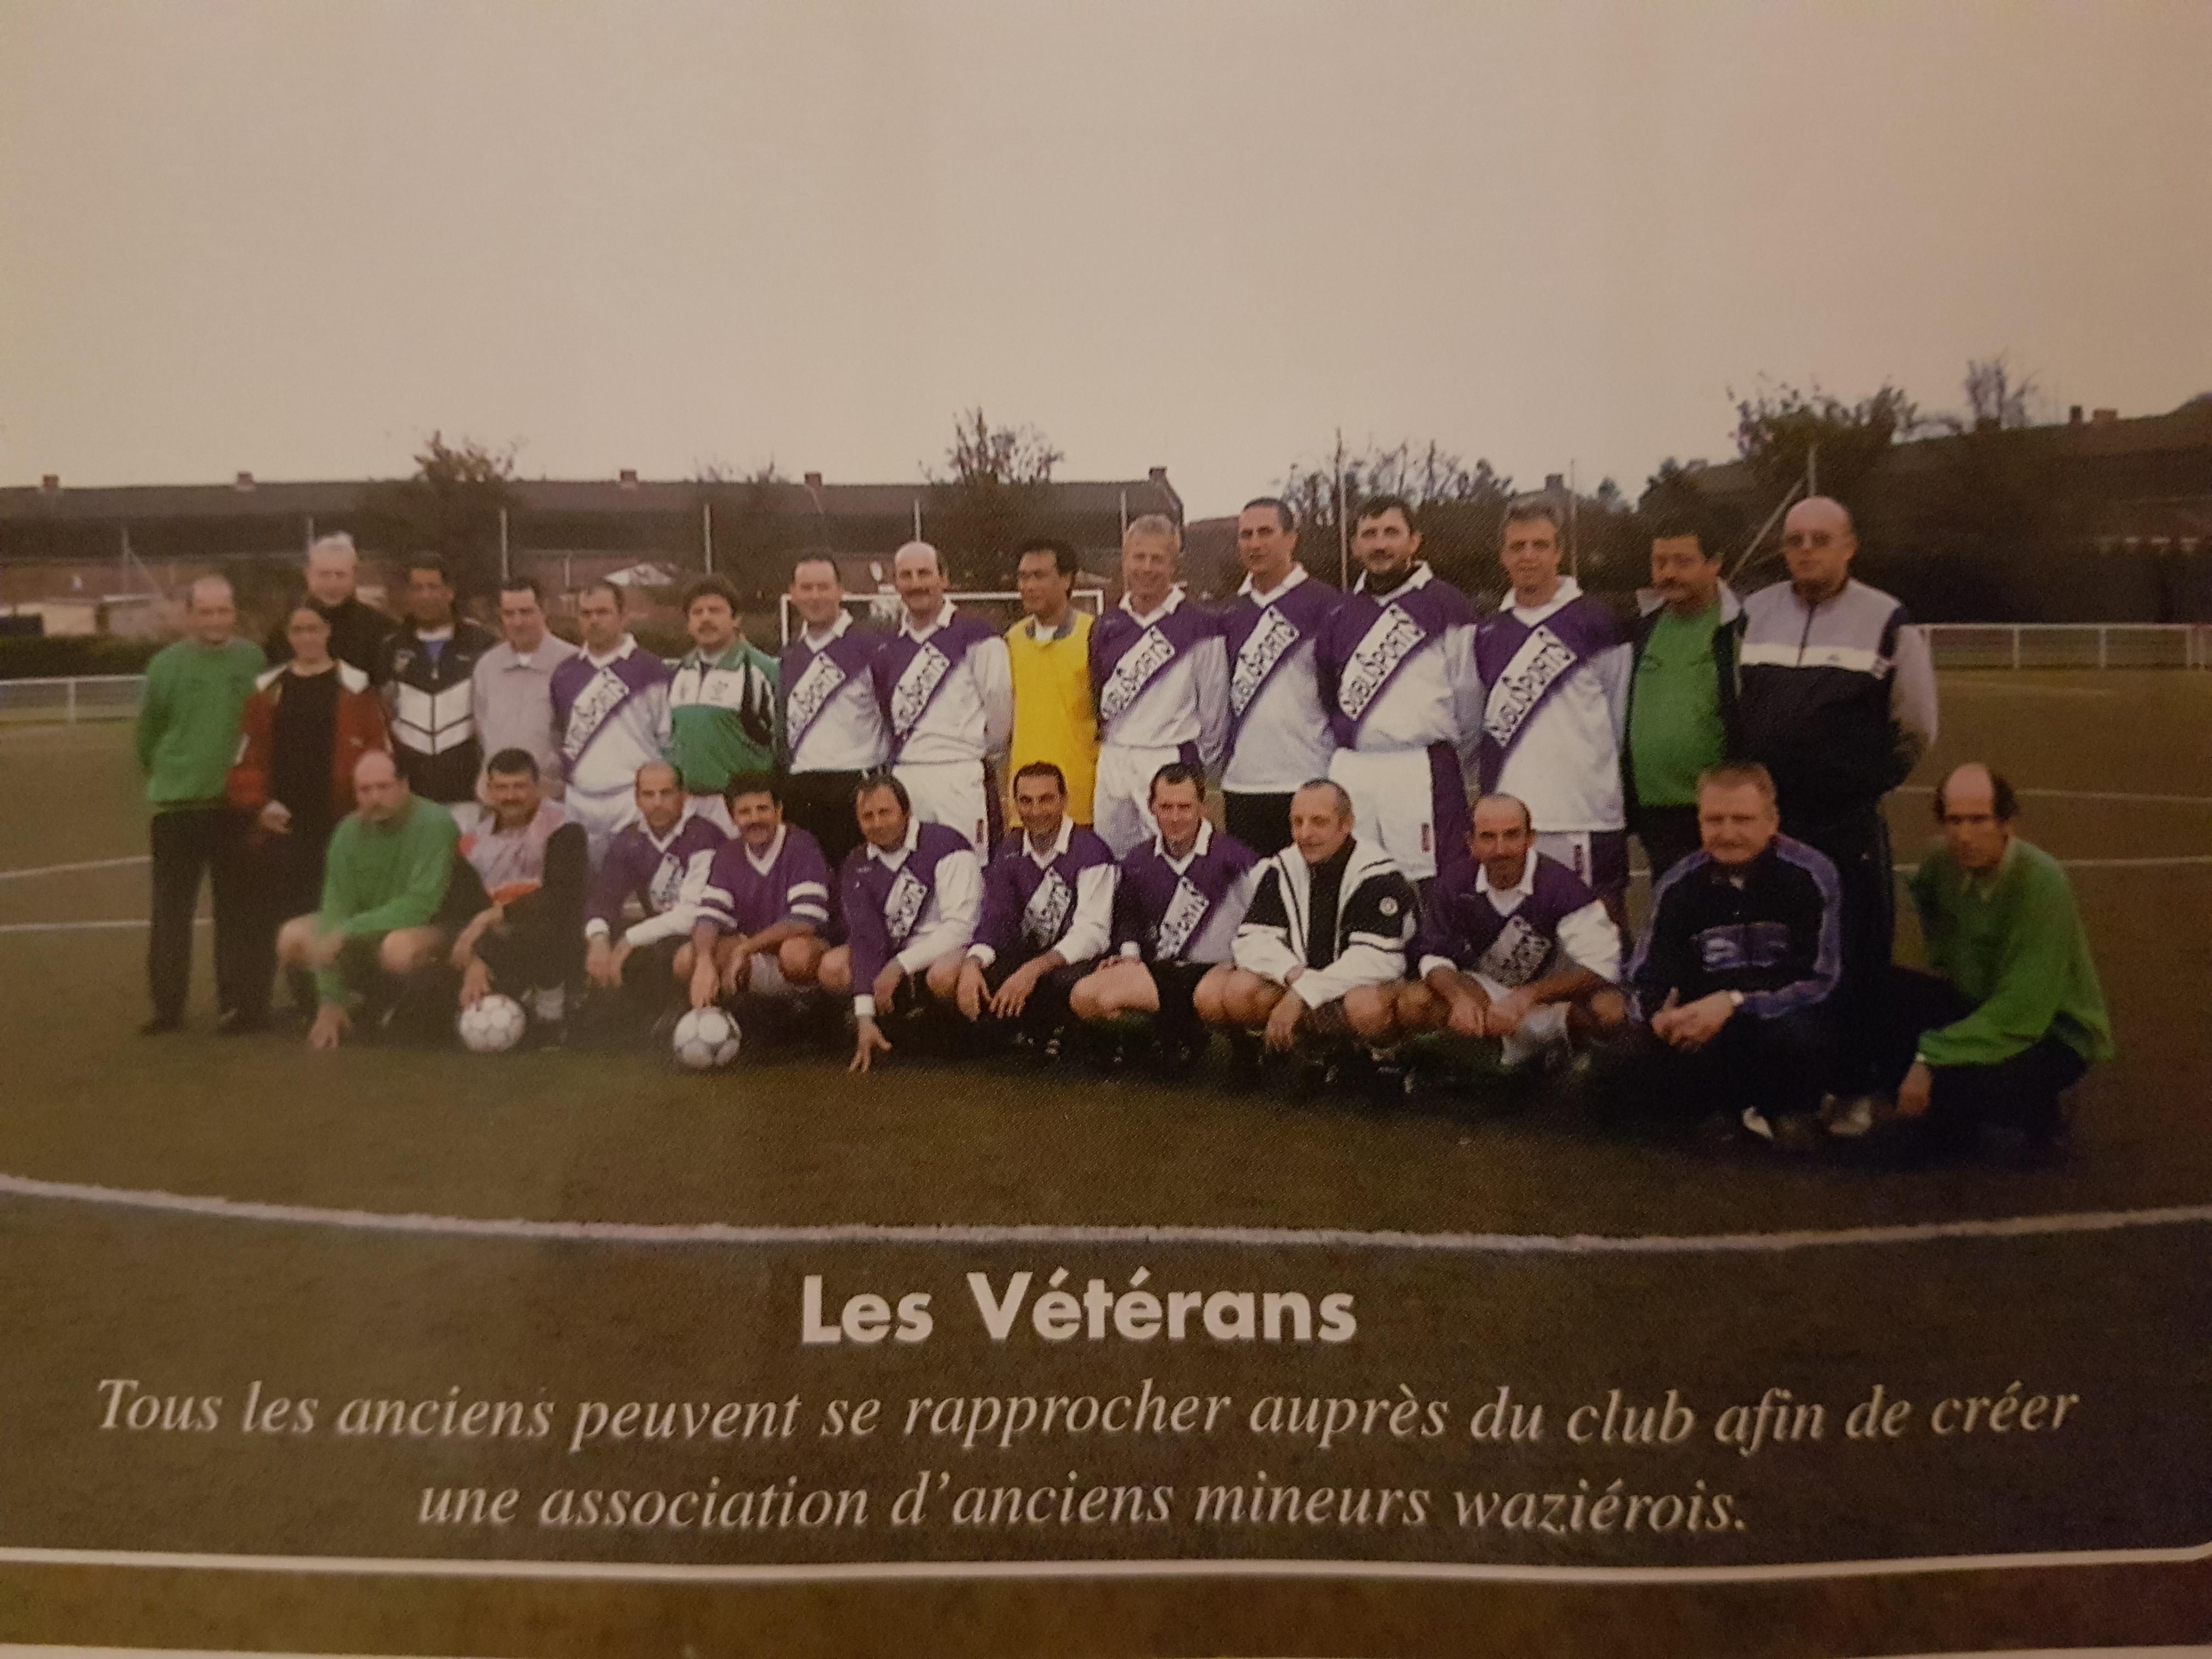 Vétérans Saison 2001 - 2002.jpg